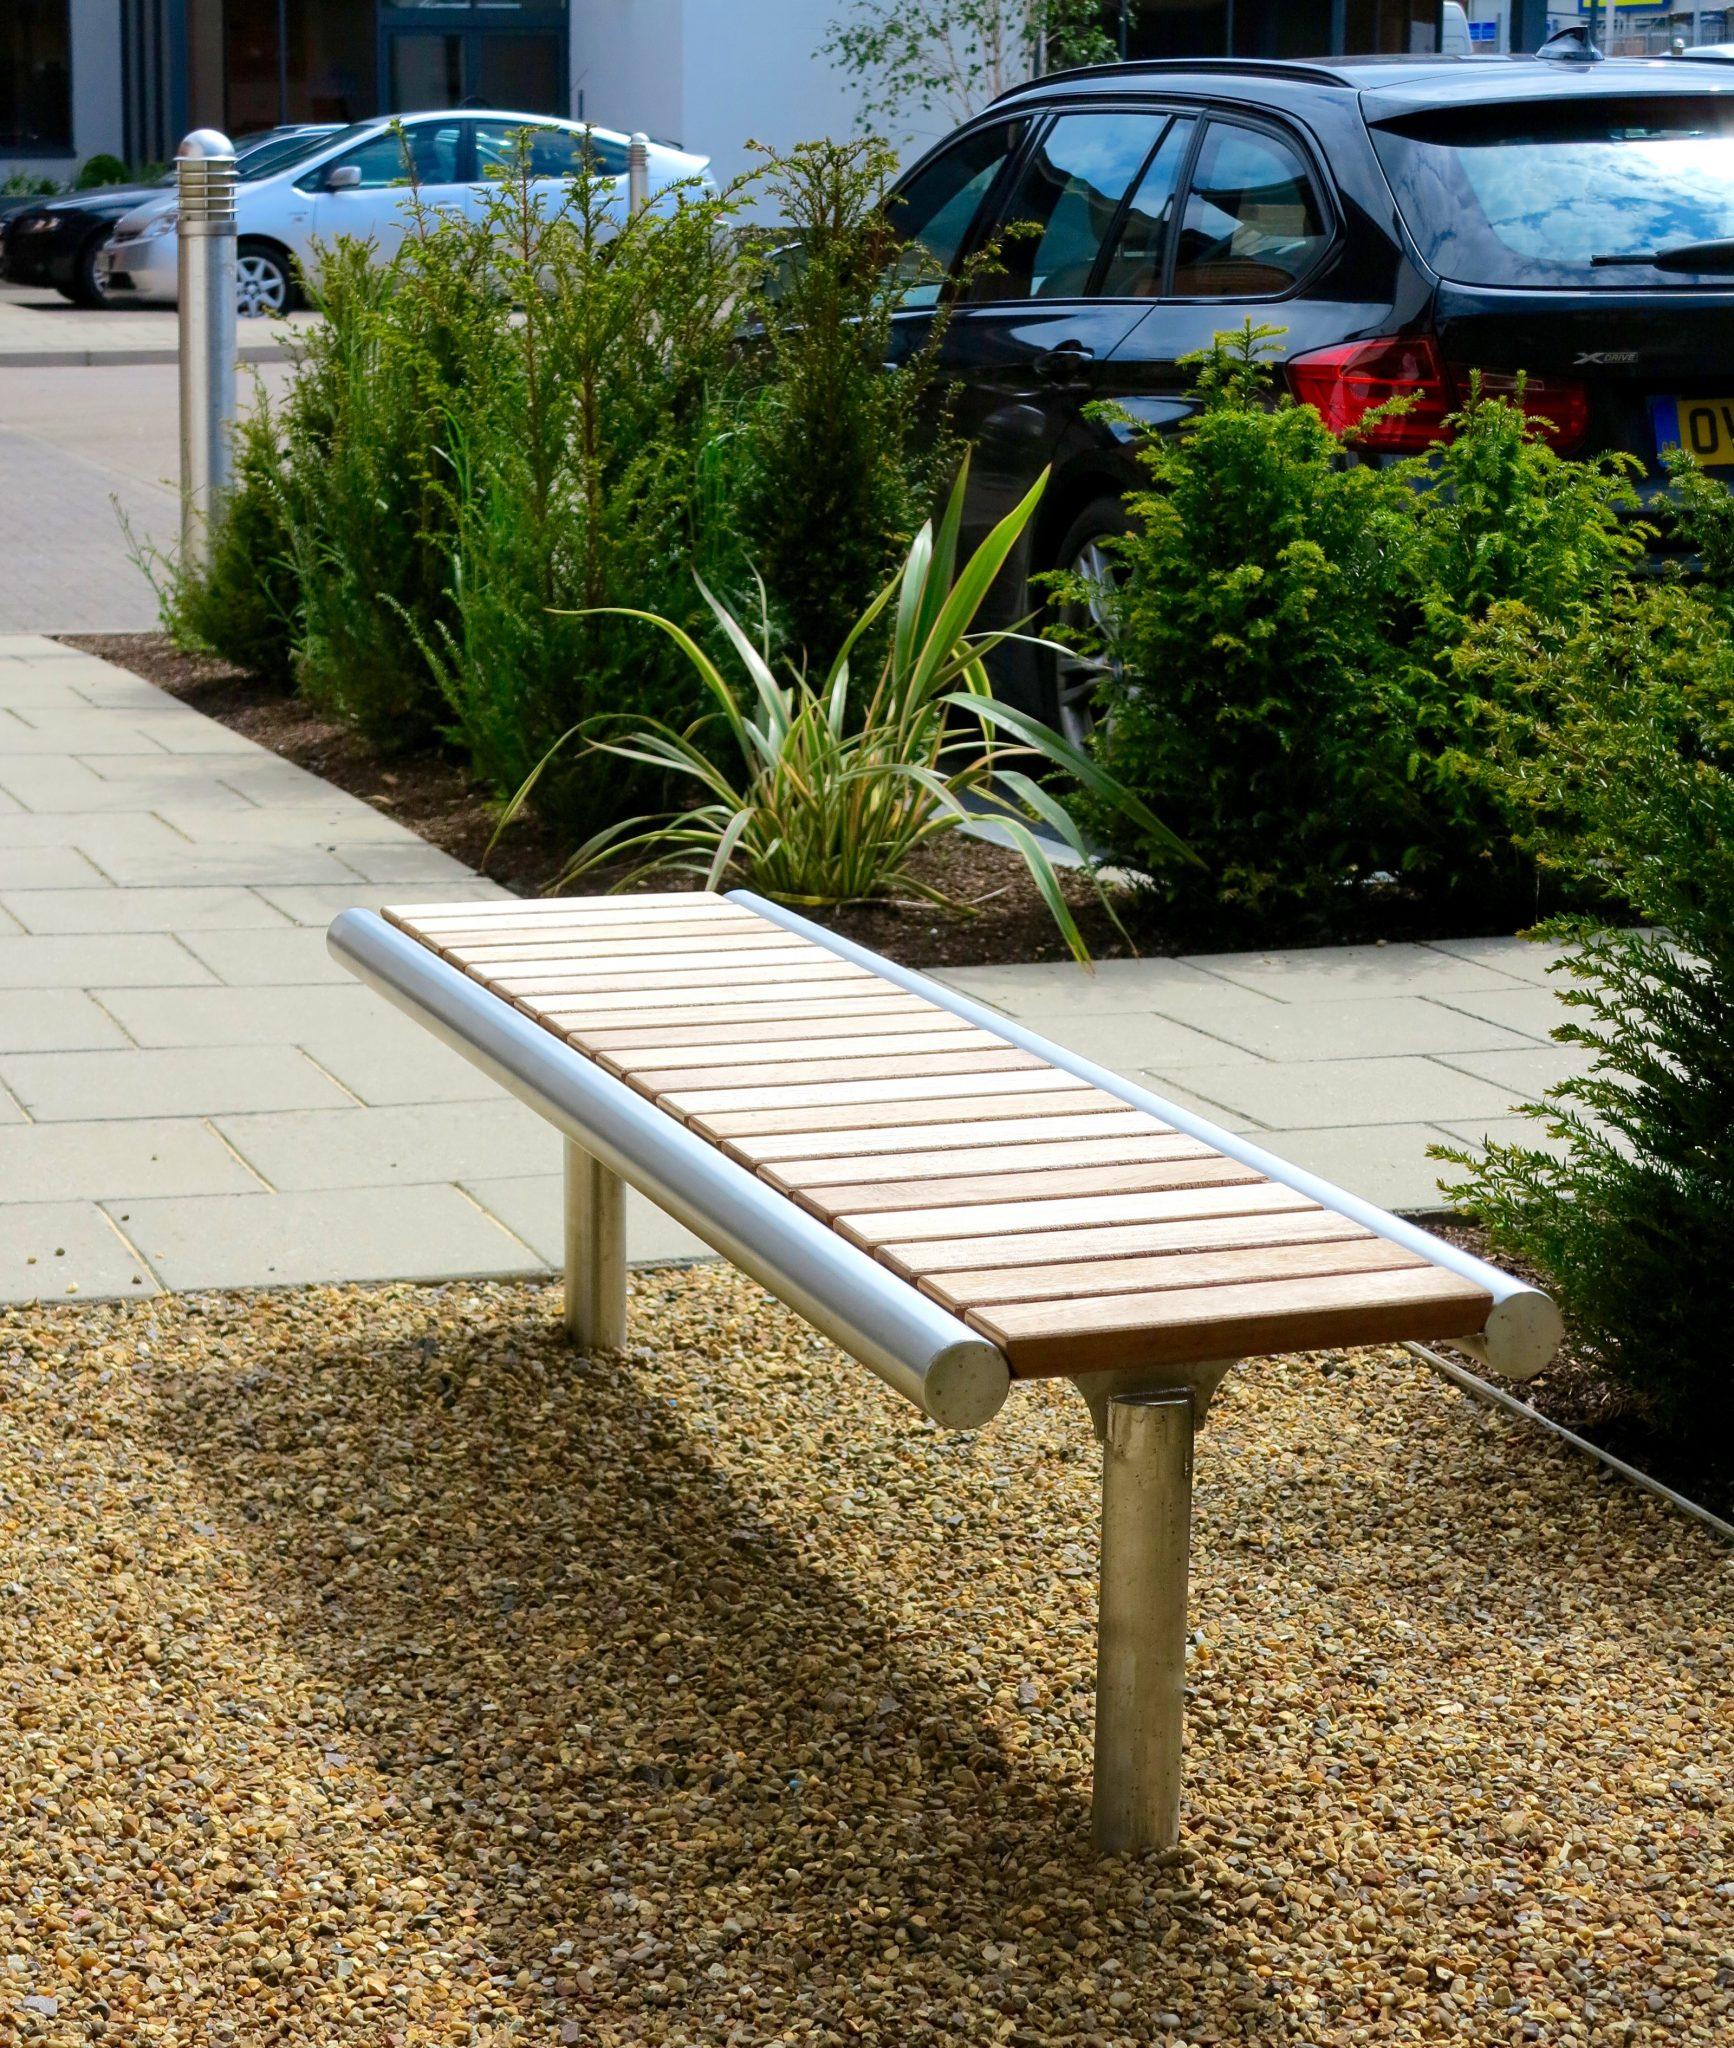 Shoreline street furniture SL006 bench - hard wood, 316 stainless steel